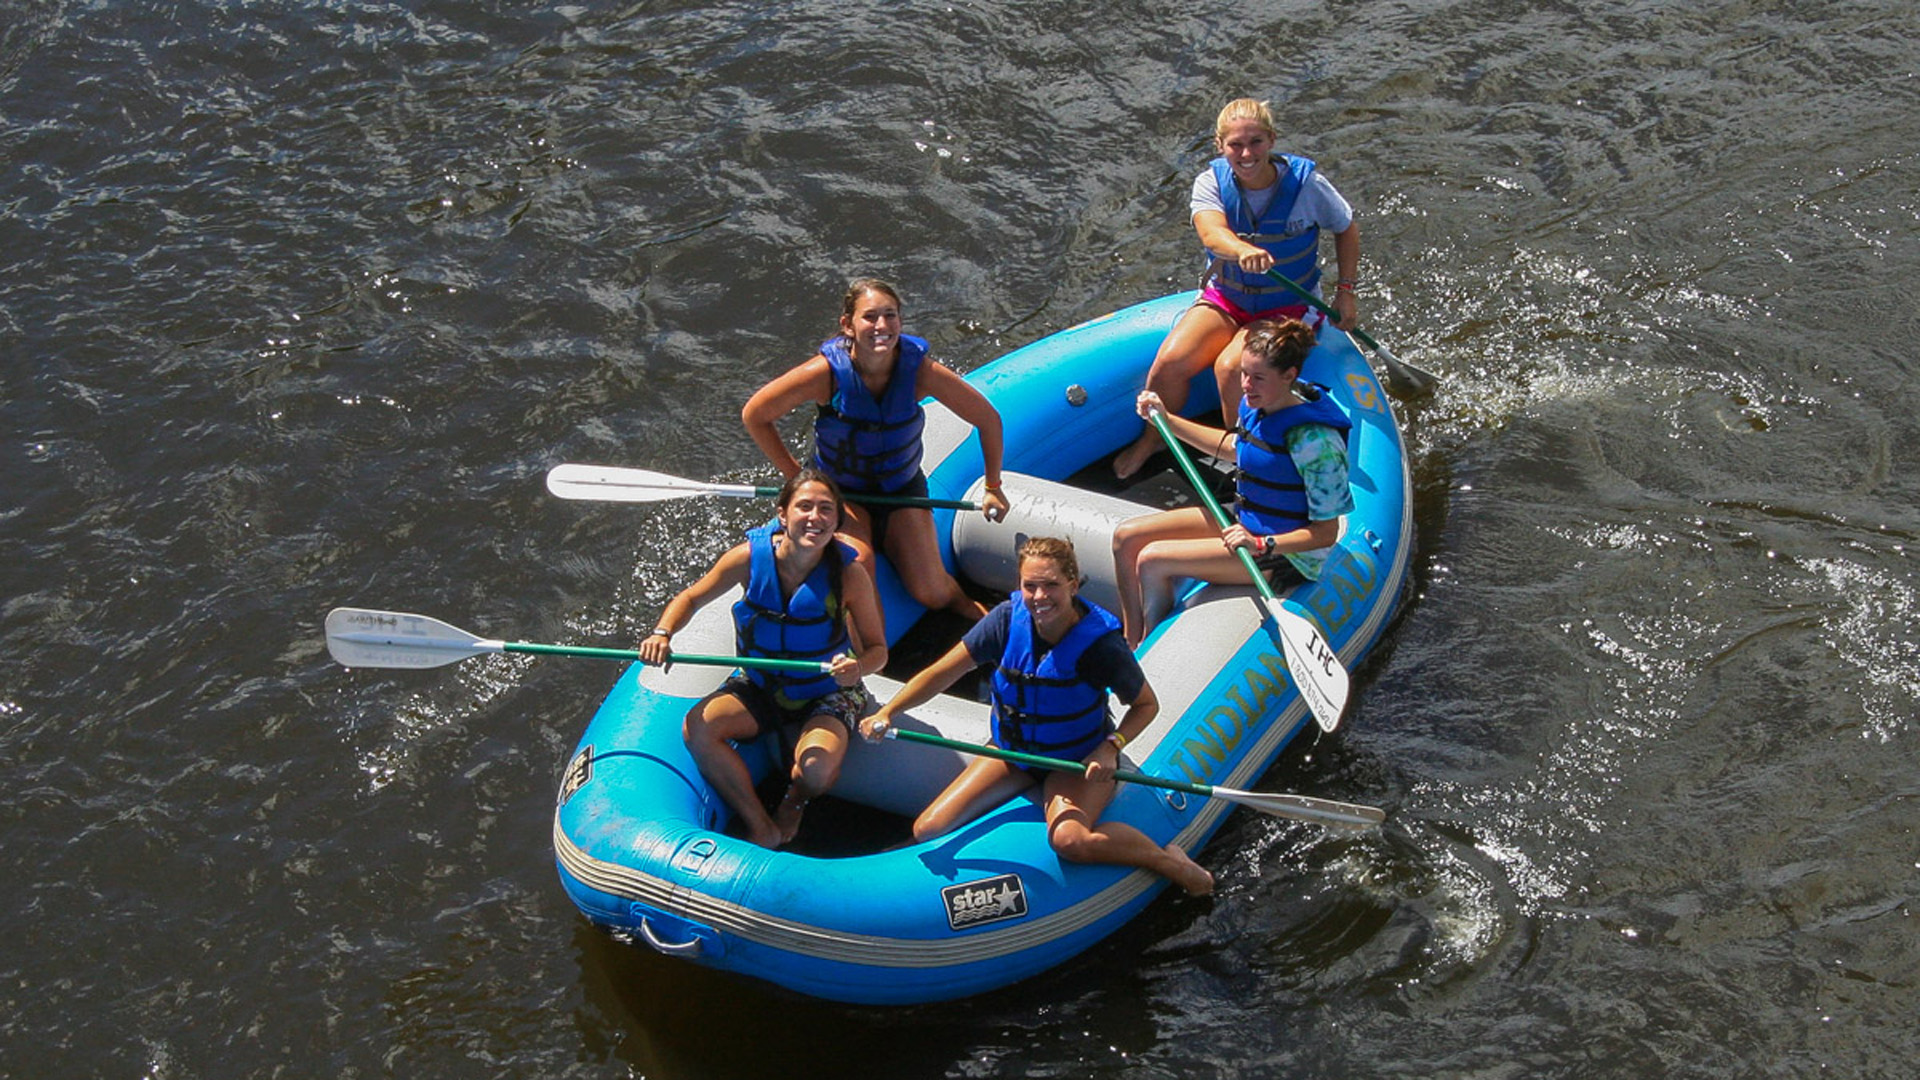 girlfriends in raft looking up at camera Indian Head Canoeing Rafting Kayaking Tubing Delaware River